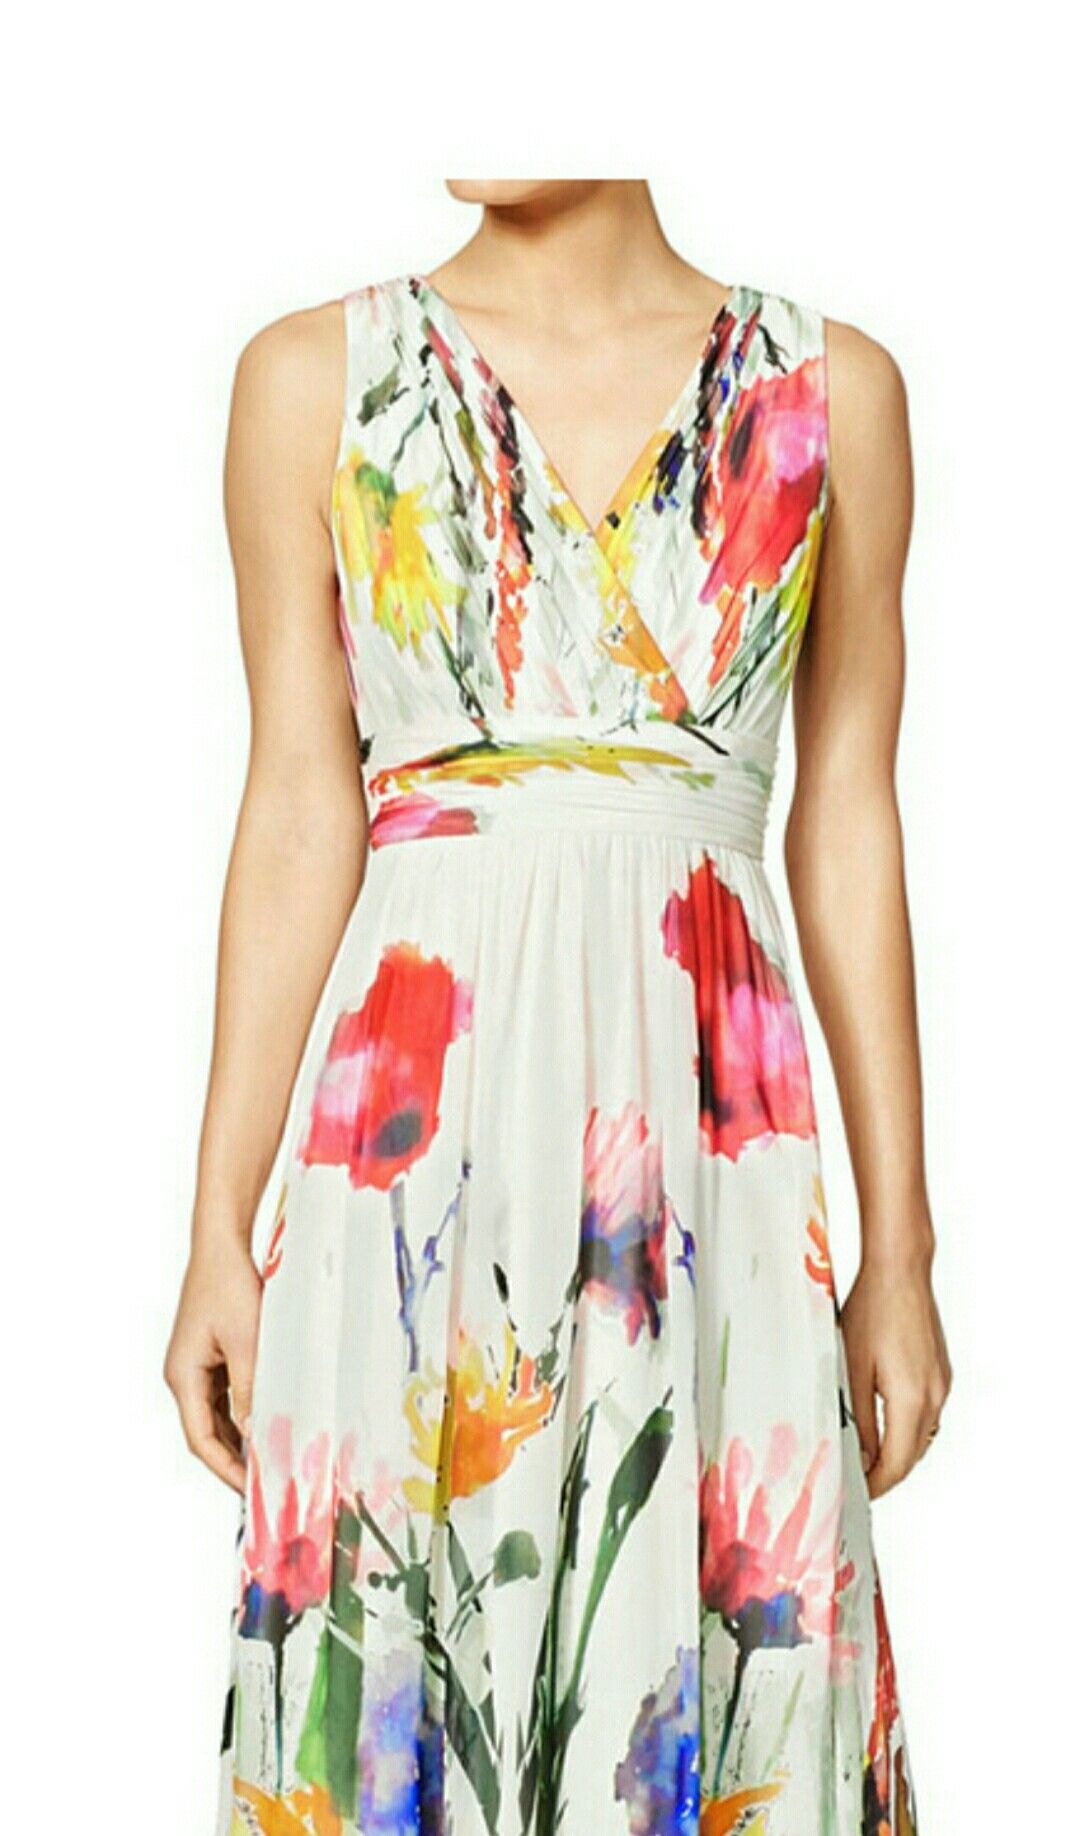 Wrap Dress 59 Walmart Dresses Moda Casual Sewing Dresses [ 1836 x 1080 Pixel ]